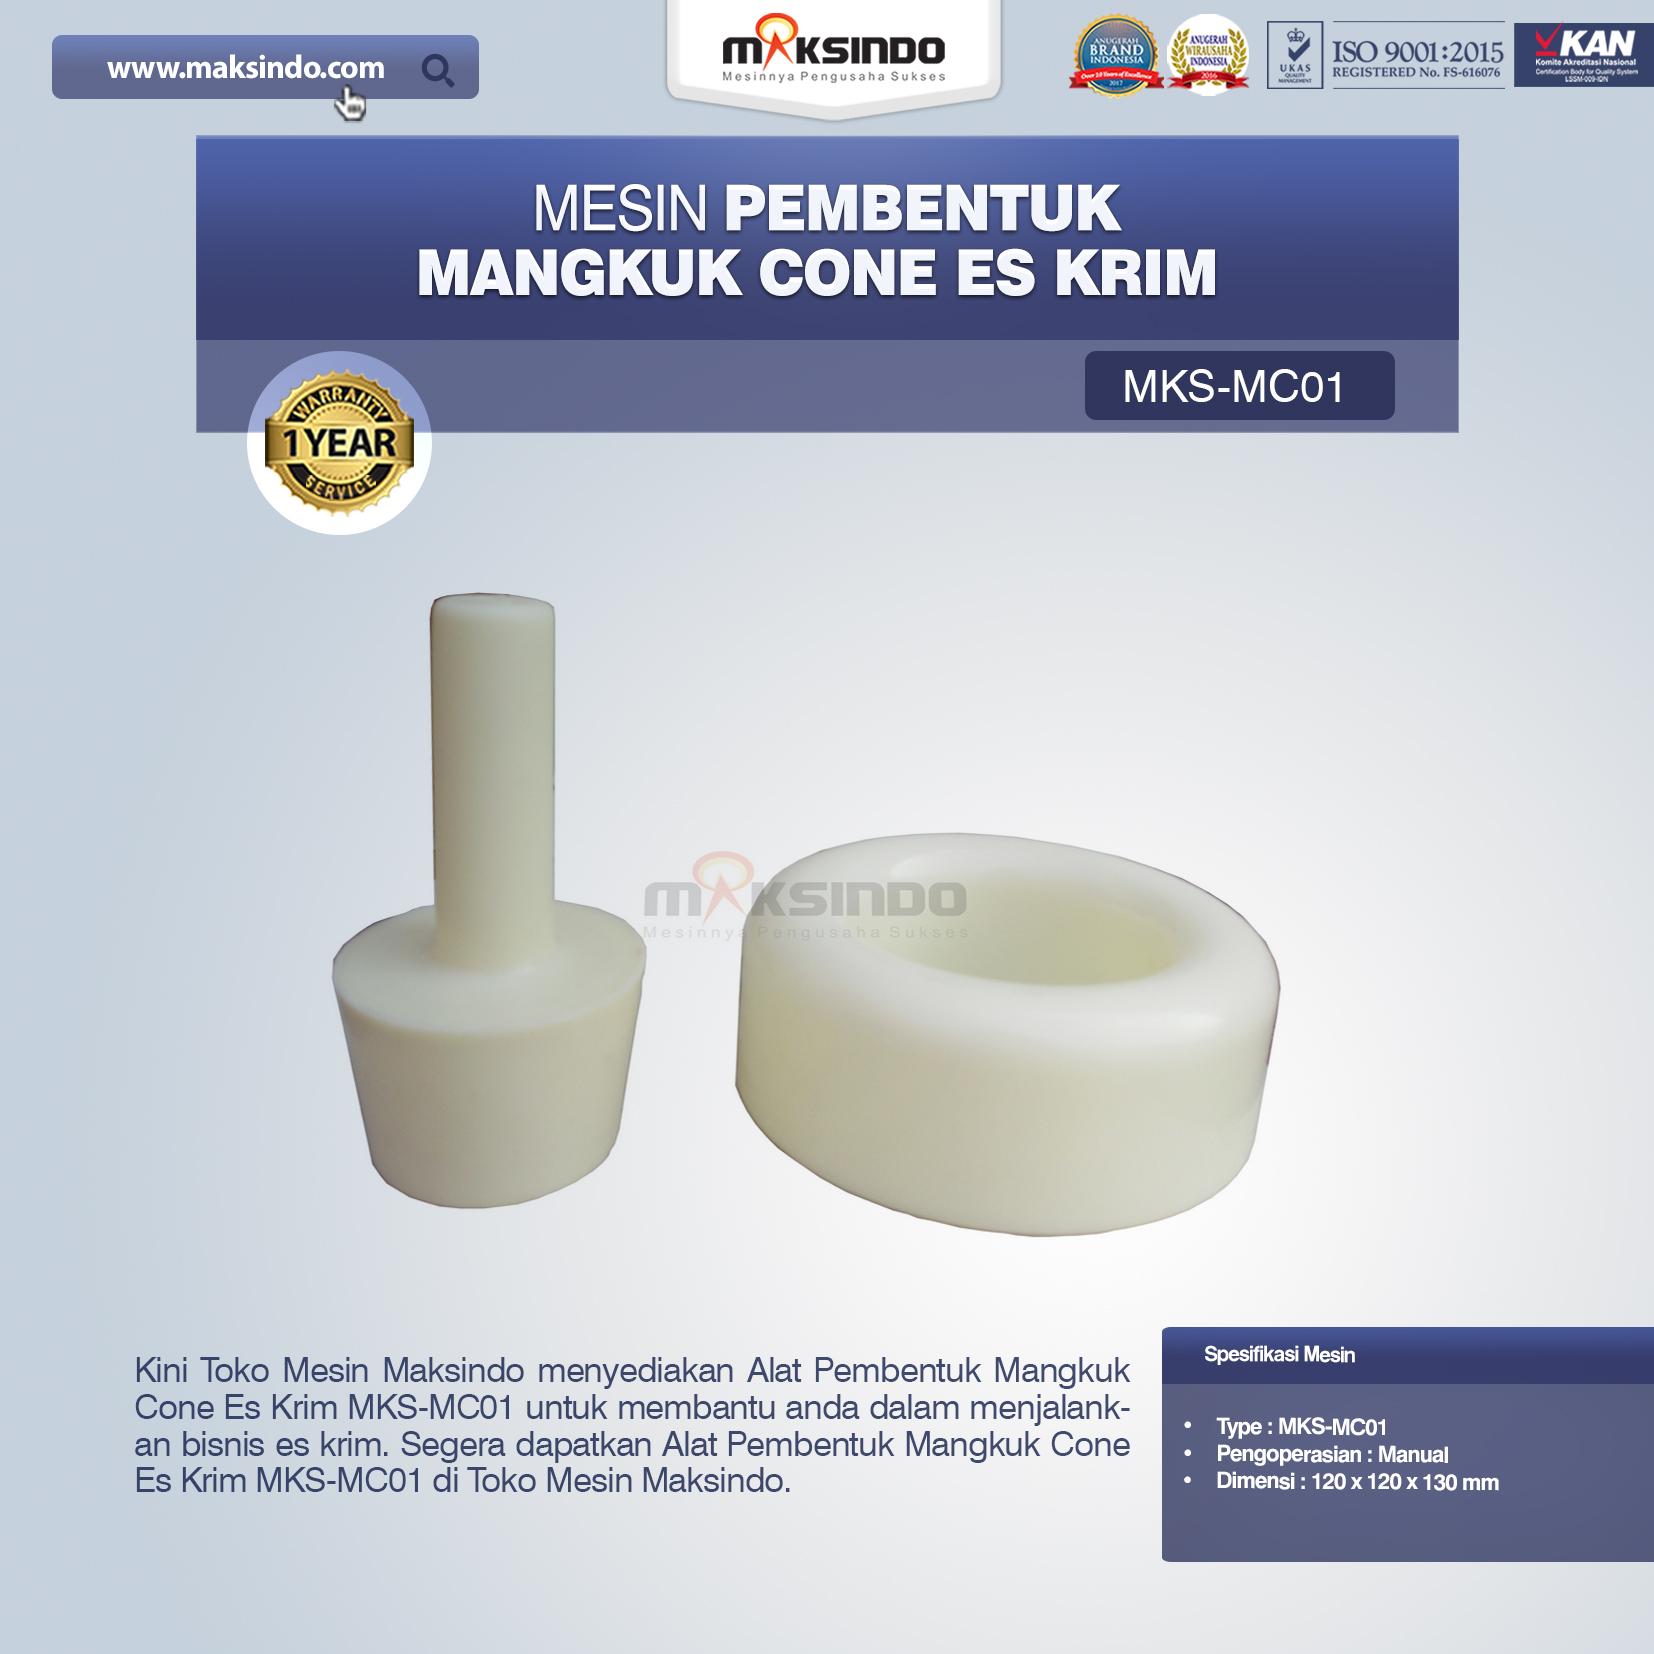 Jual Alat Pembentuk Mangkuk Cone Es Krim MKS-MC01 Di Pekanbaru